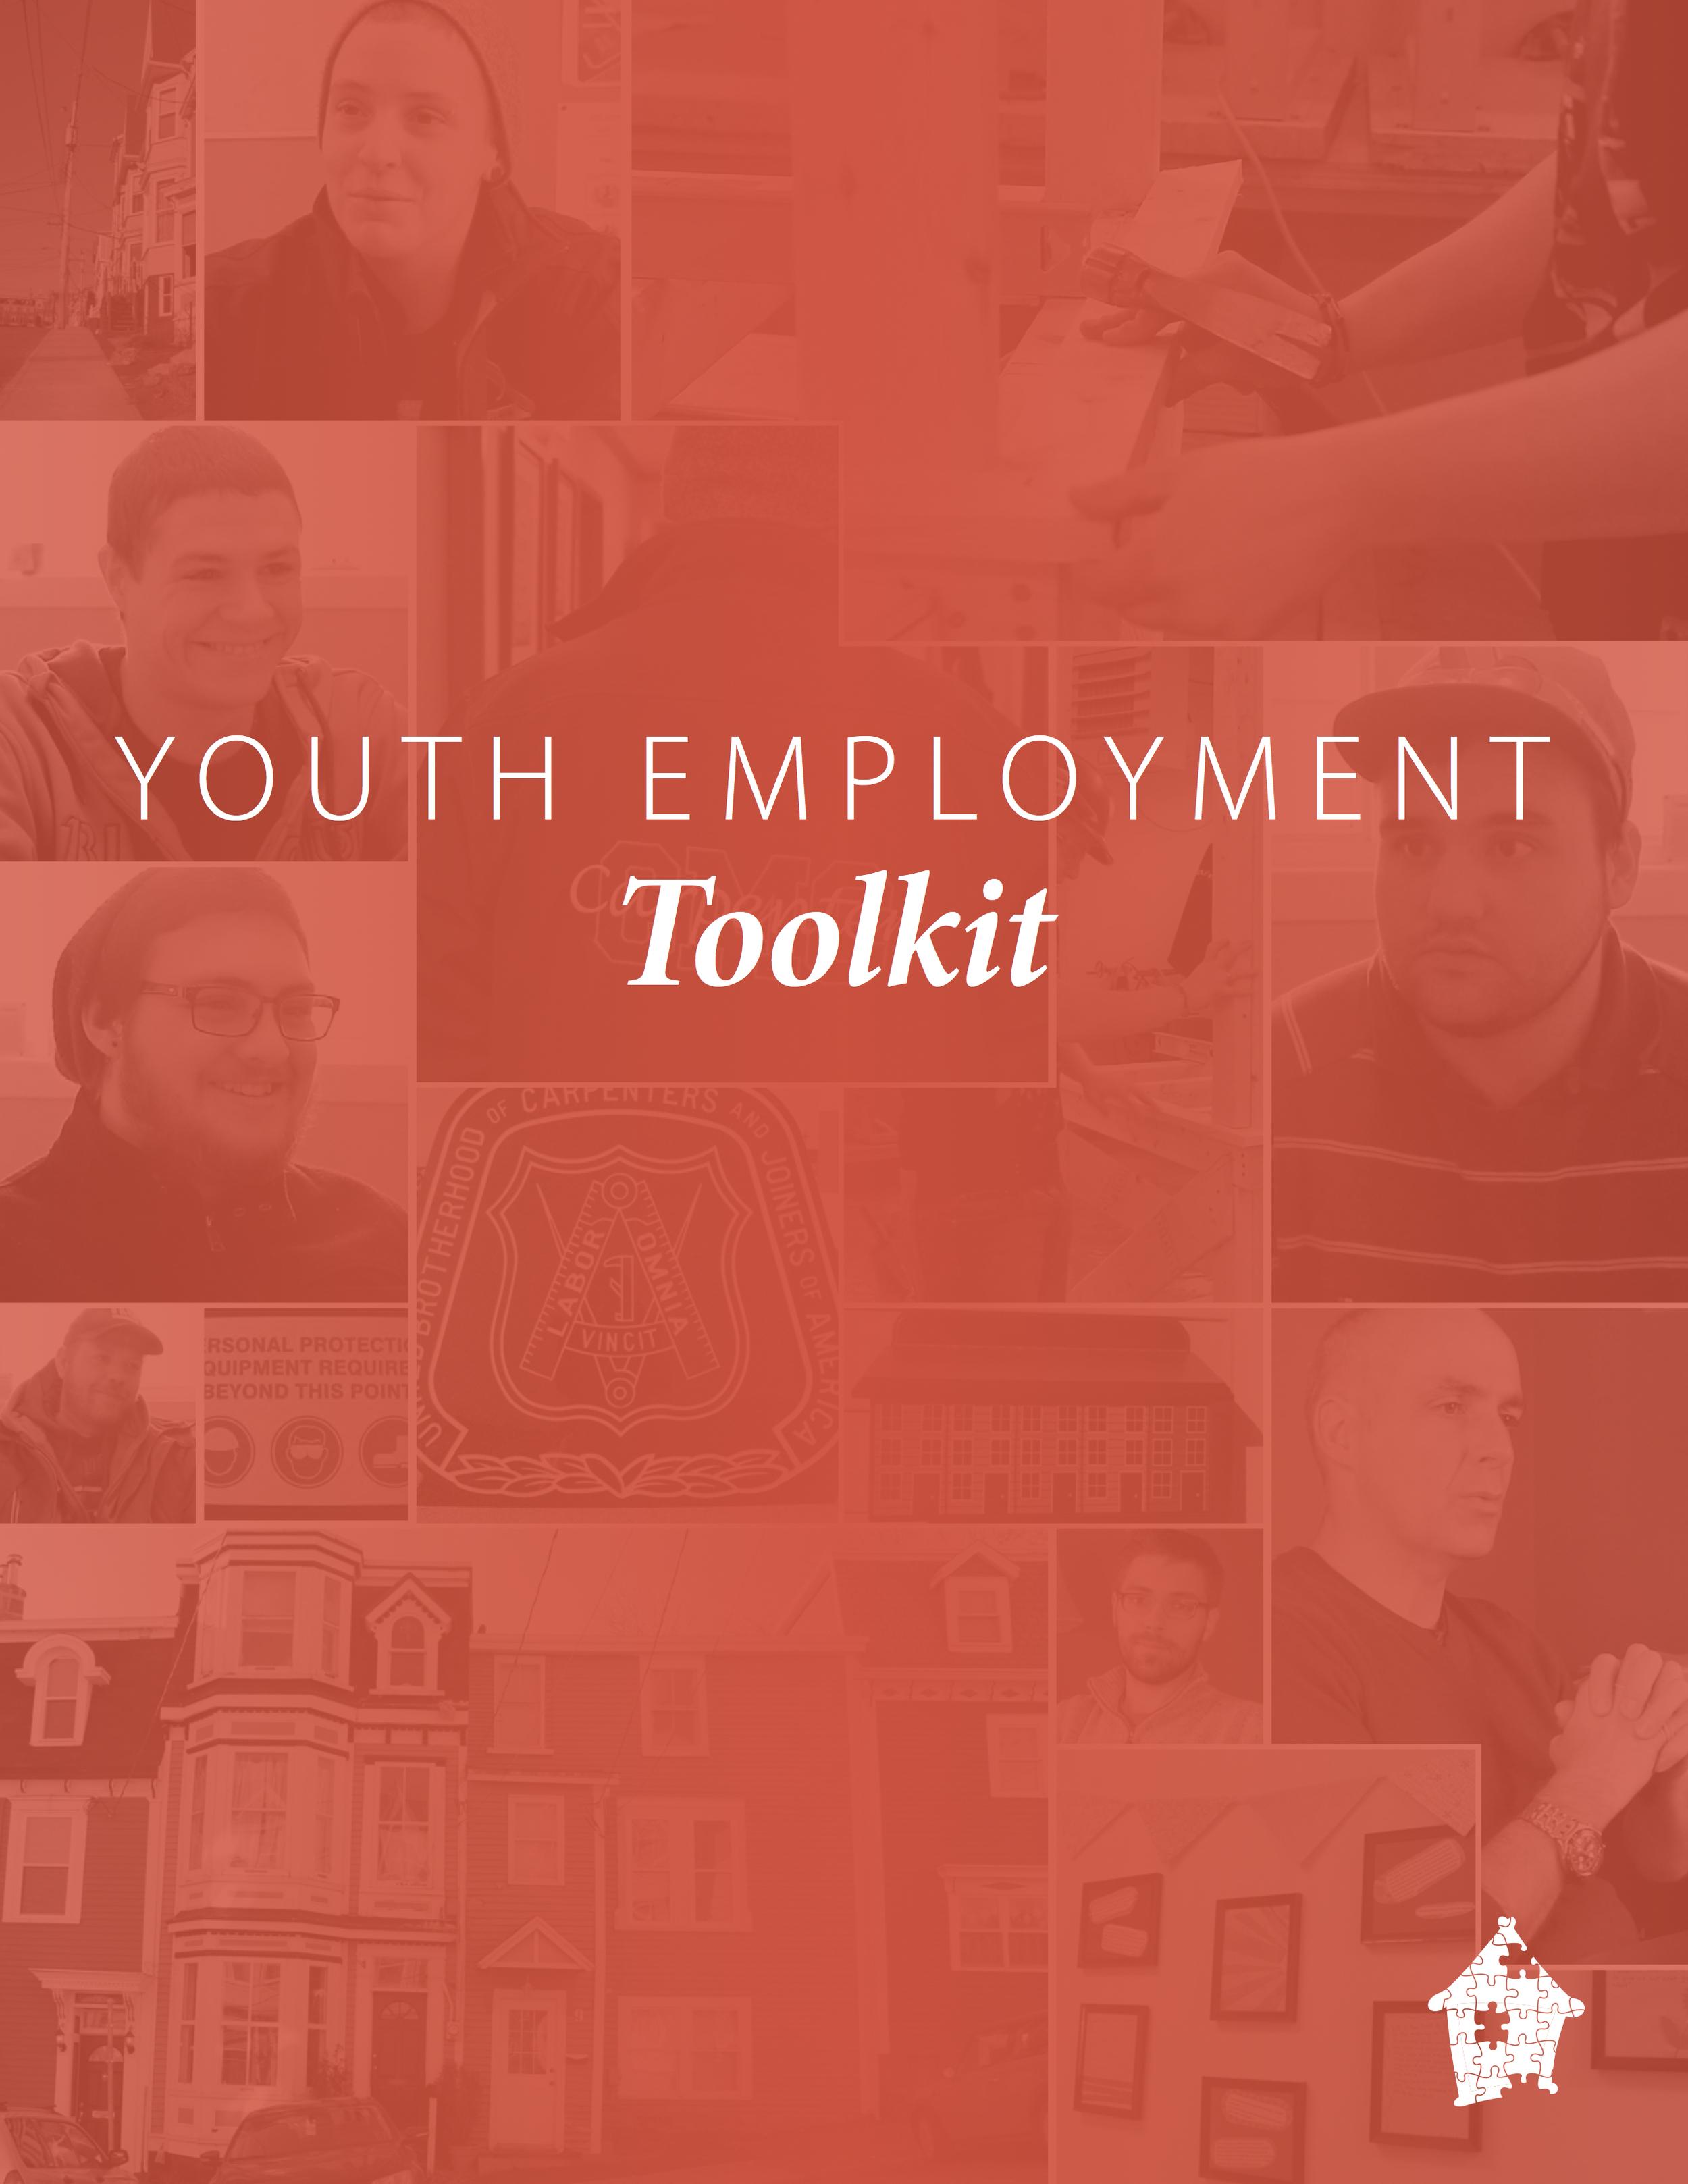 Youth Employment Toolkit - copie.jpg